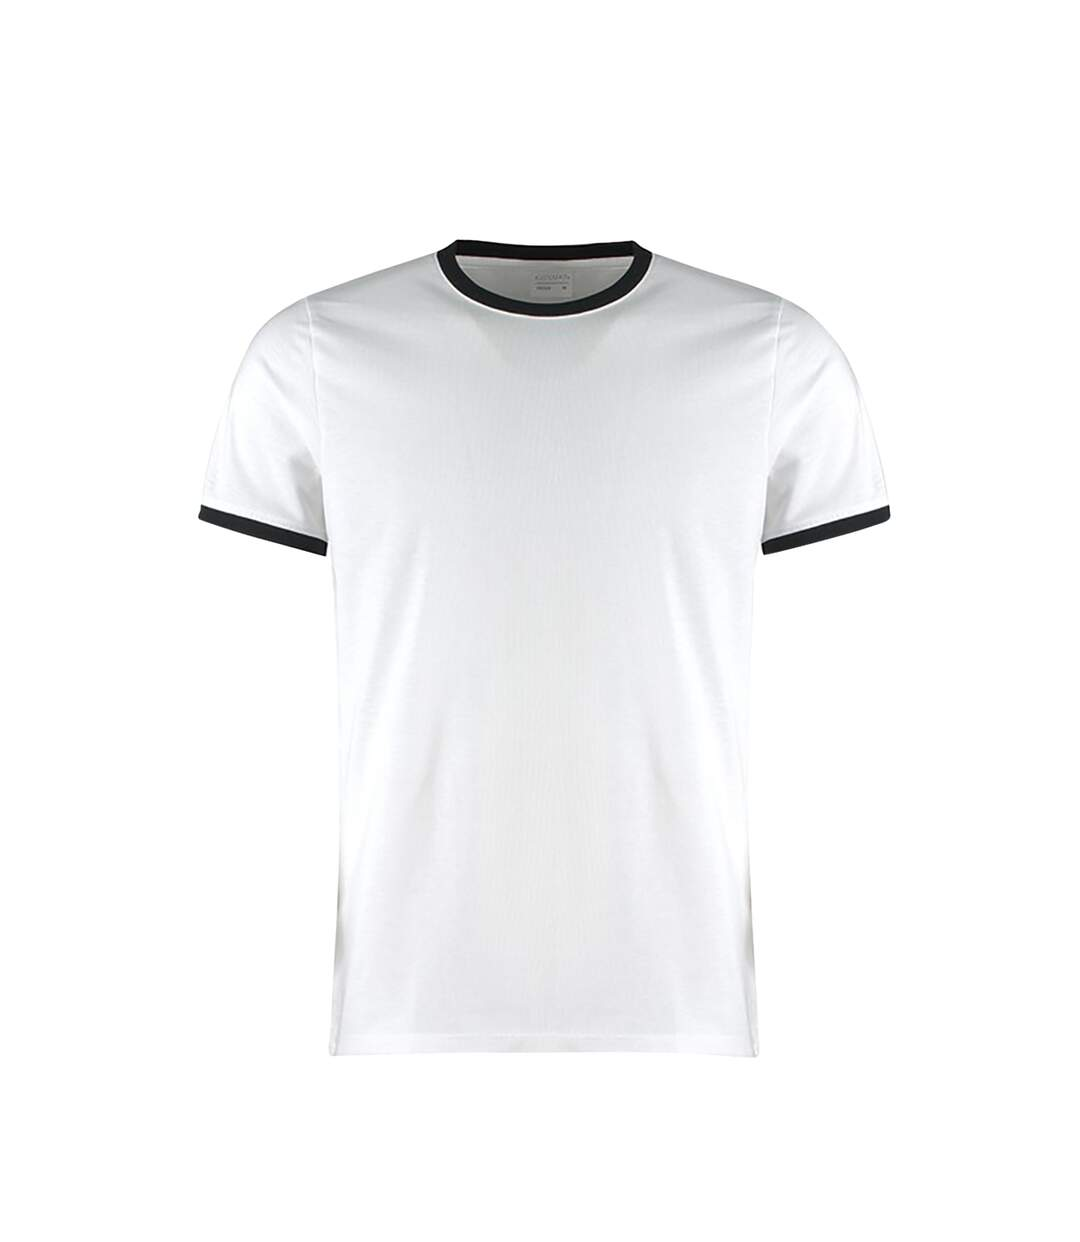 Kustom Kit Mens Fashion Fit Ringer T-Shirt (White/Black) - UTPC3837